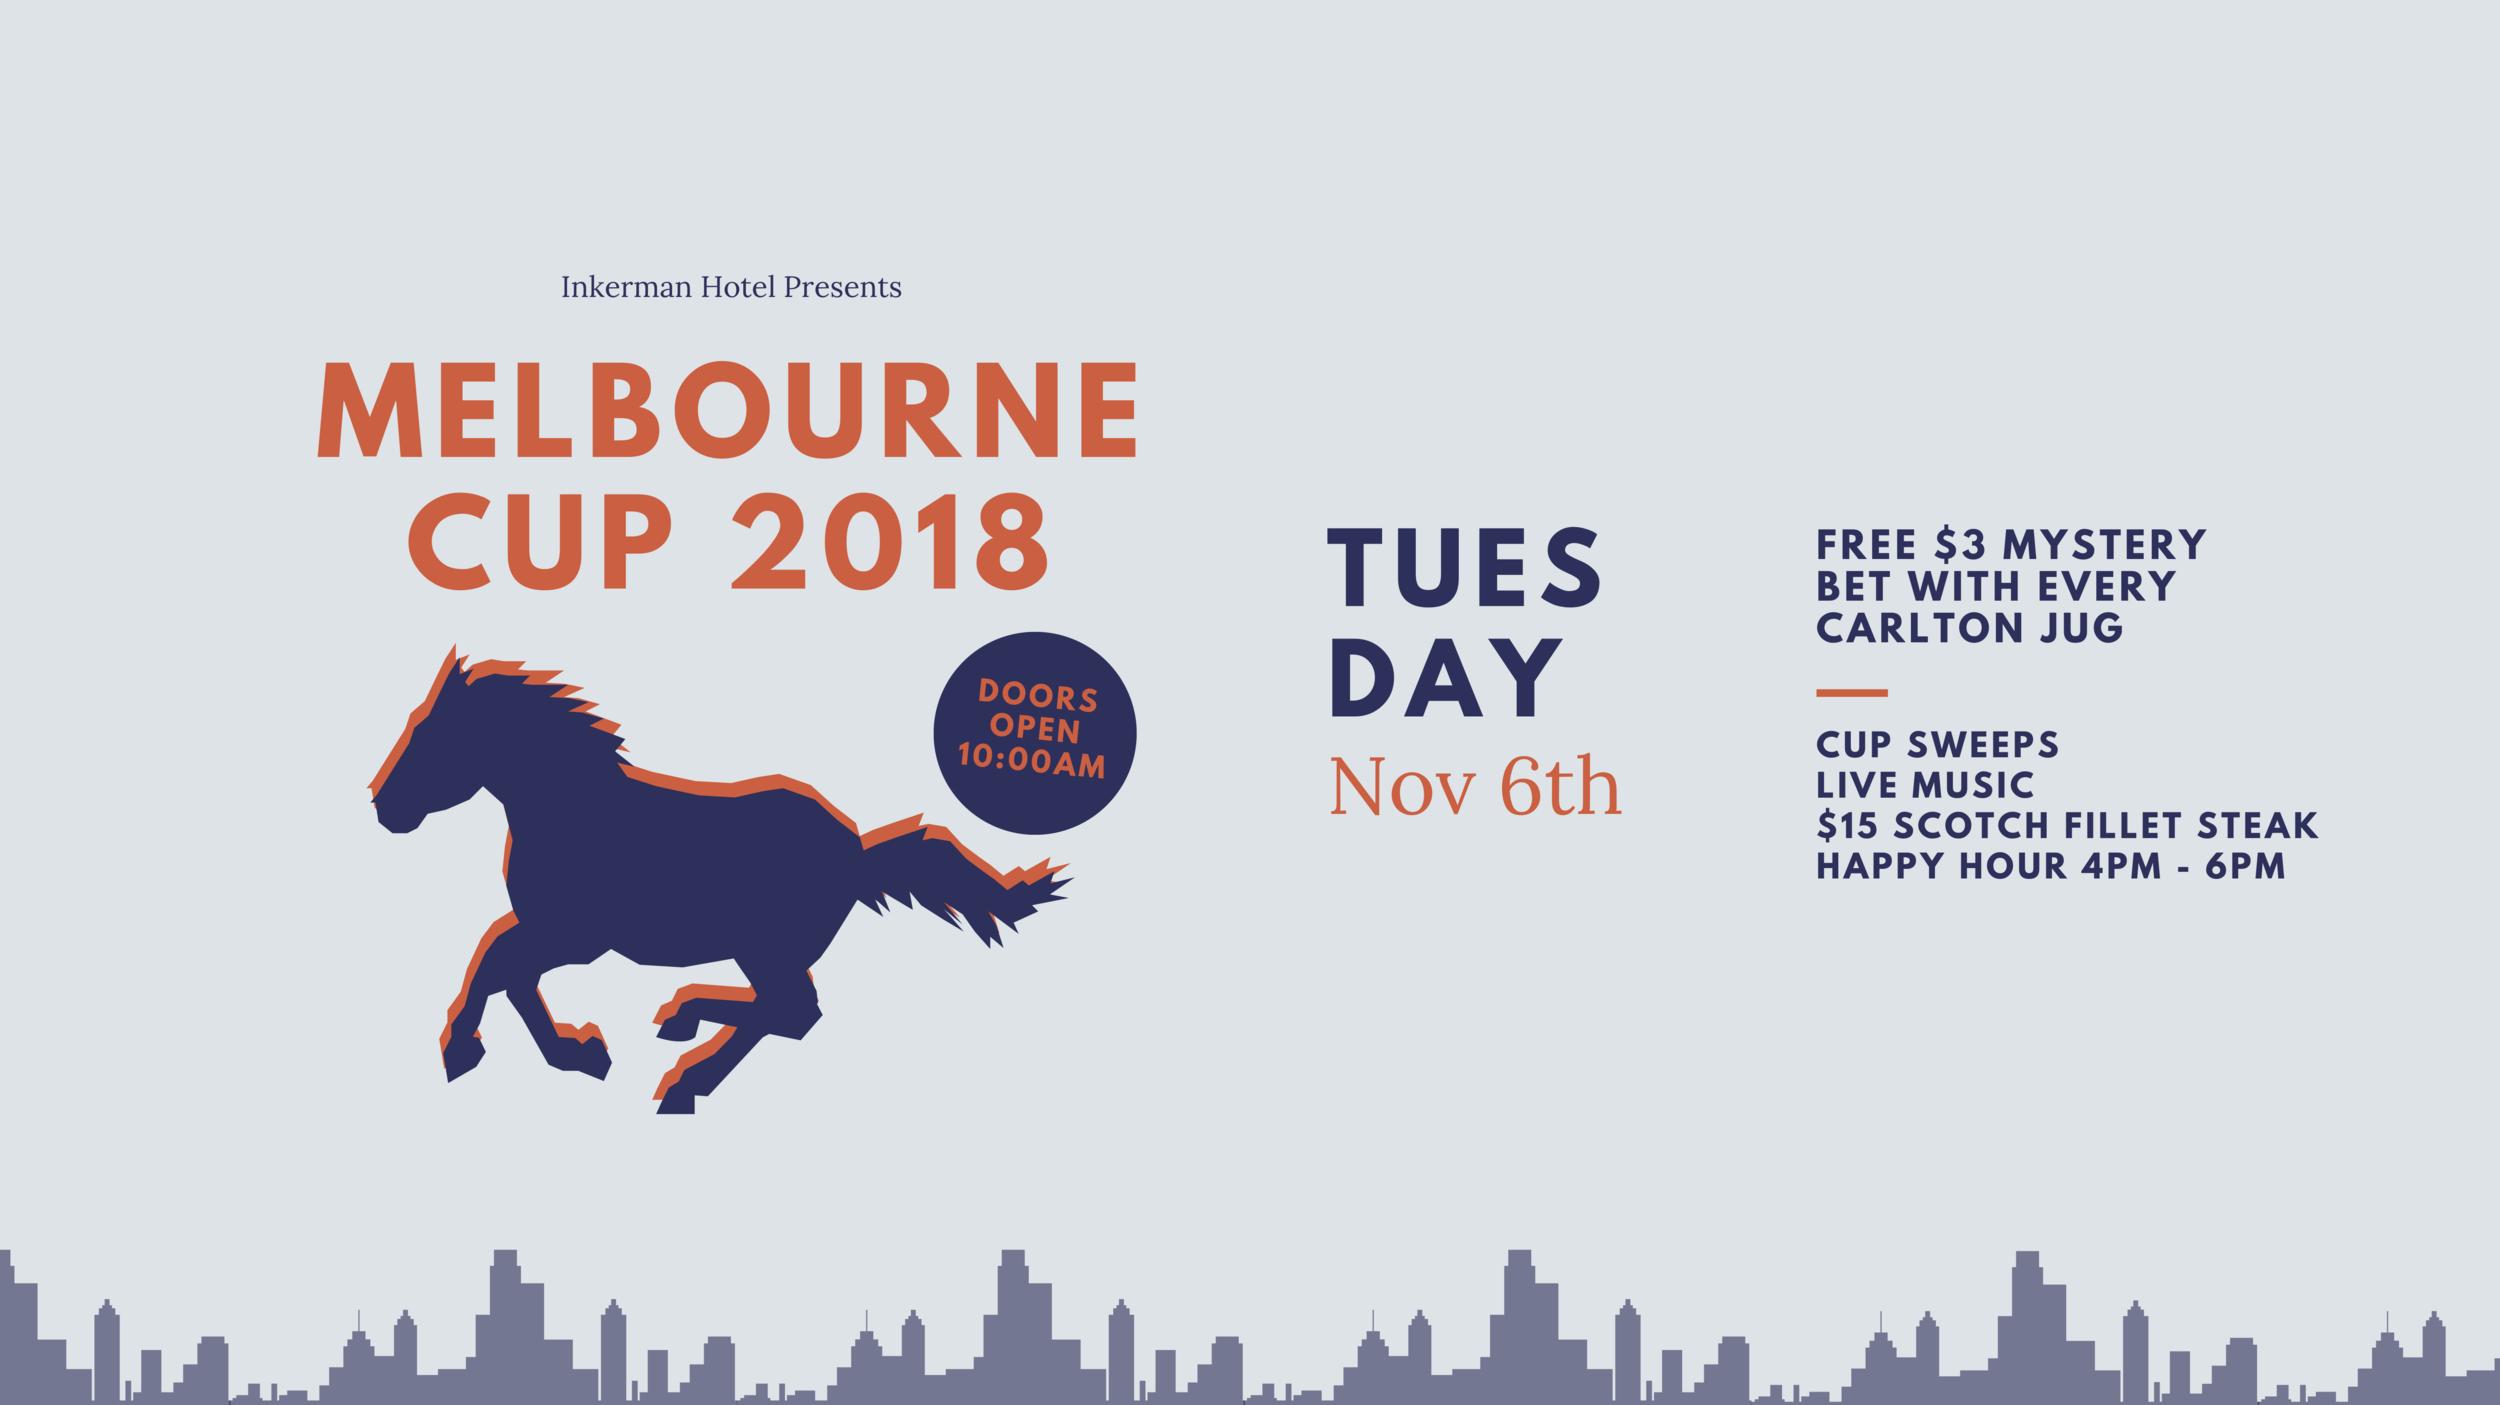 Inkerman Melbourne Cup 2018-2 copy.png